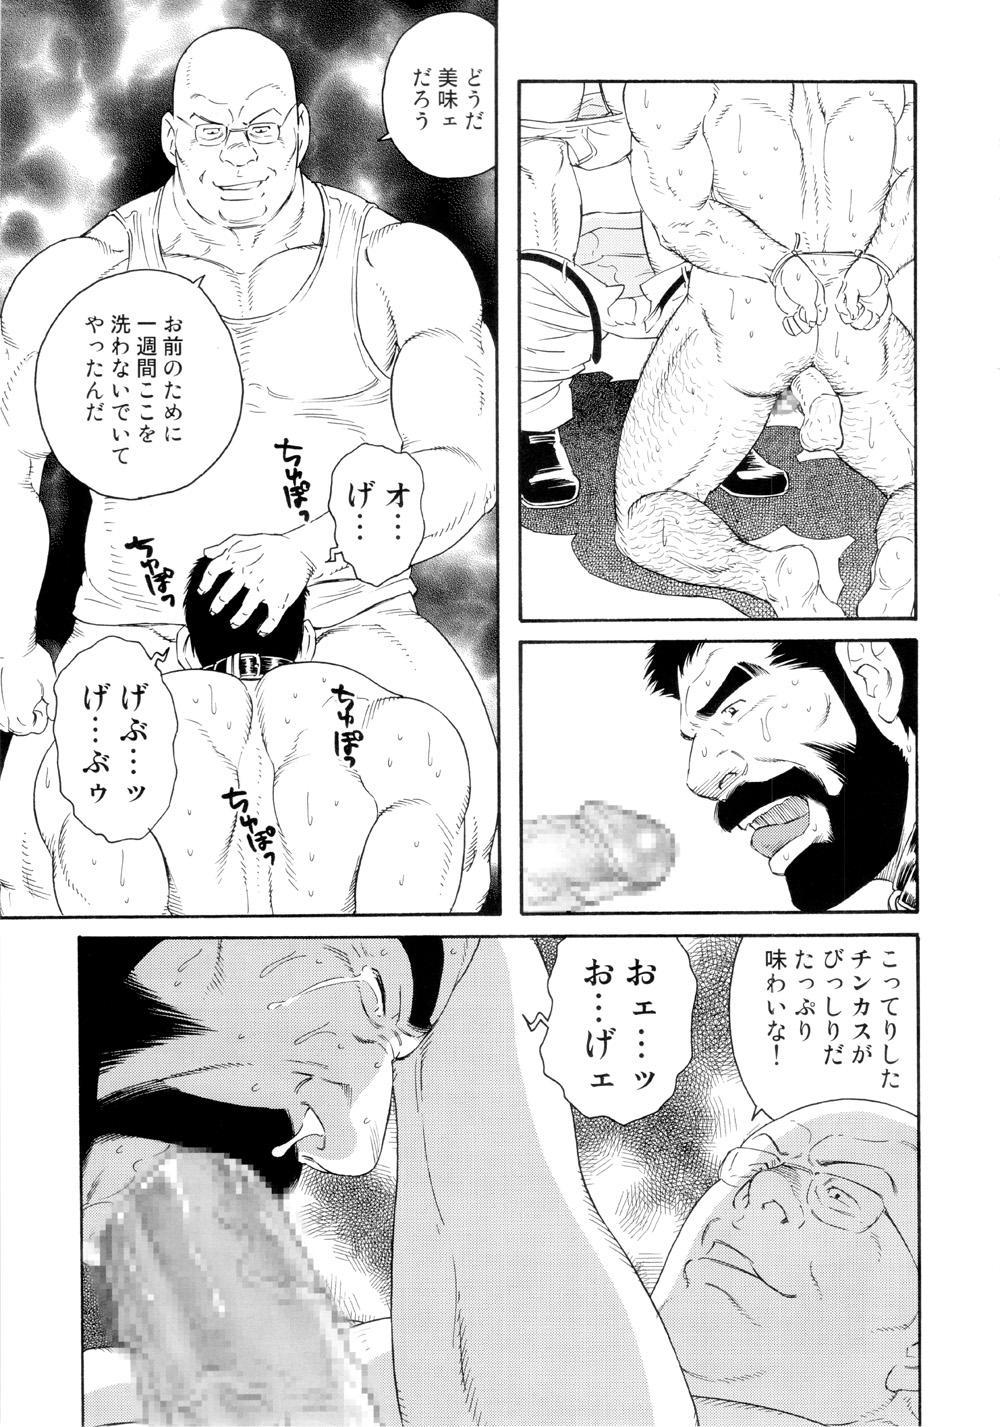 Genryu Chapter 1 12